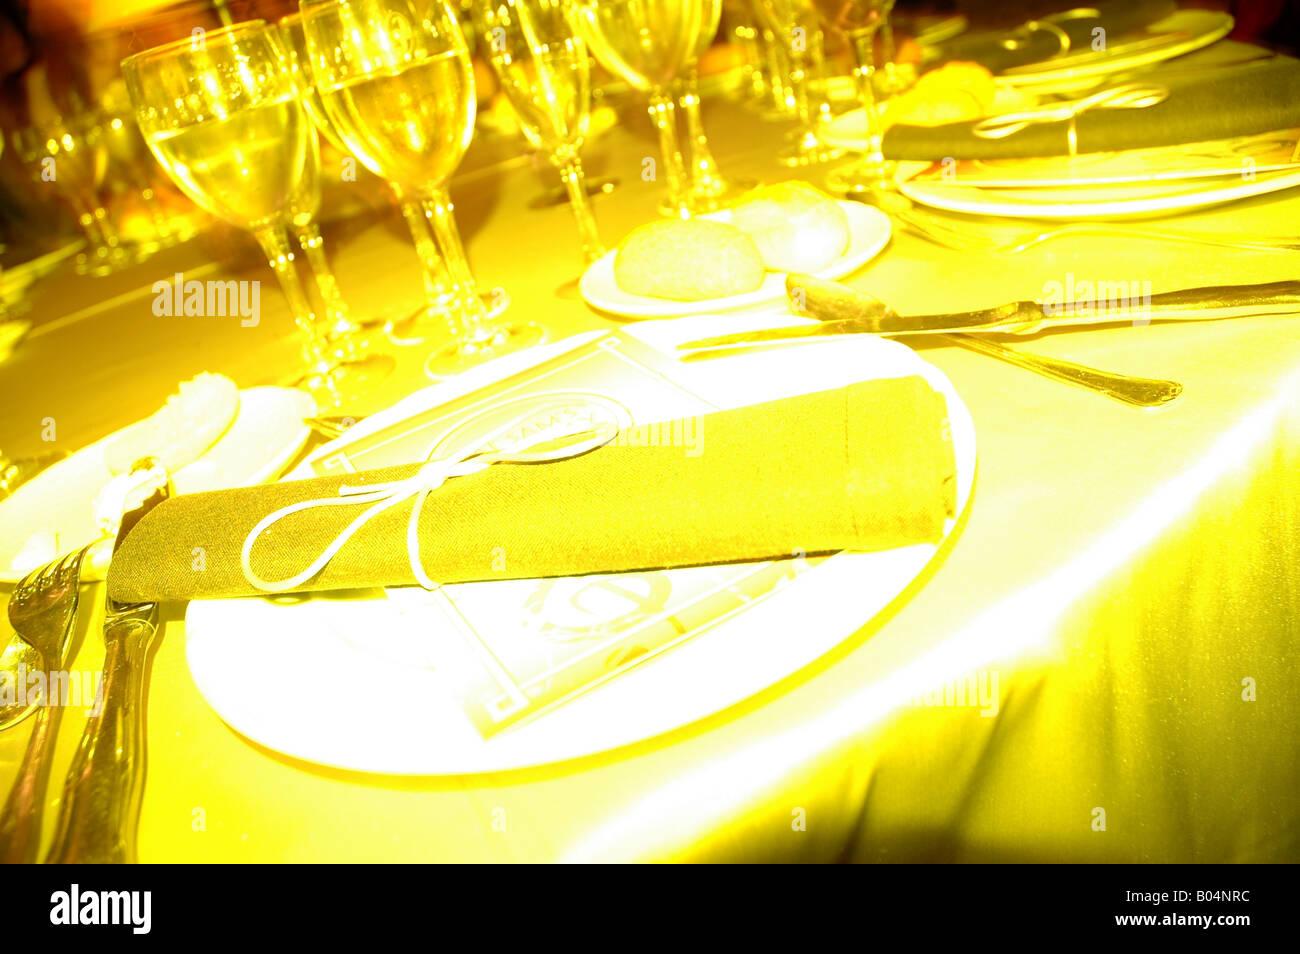 Besteck Cutlery Teller Plate Tisch Table Desk Board Trinkglas Stock Photo Alamy